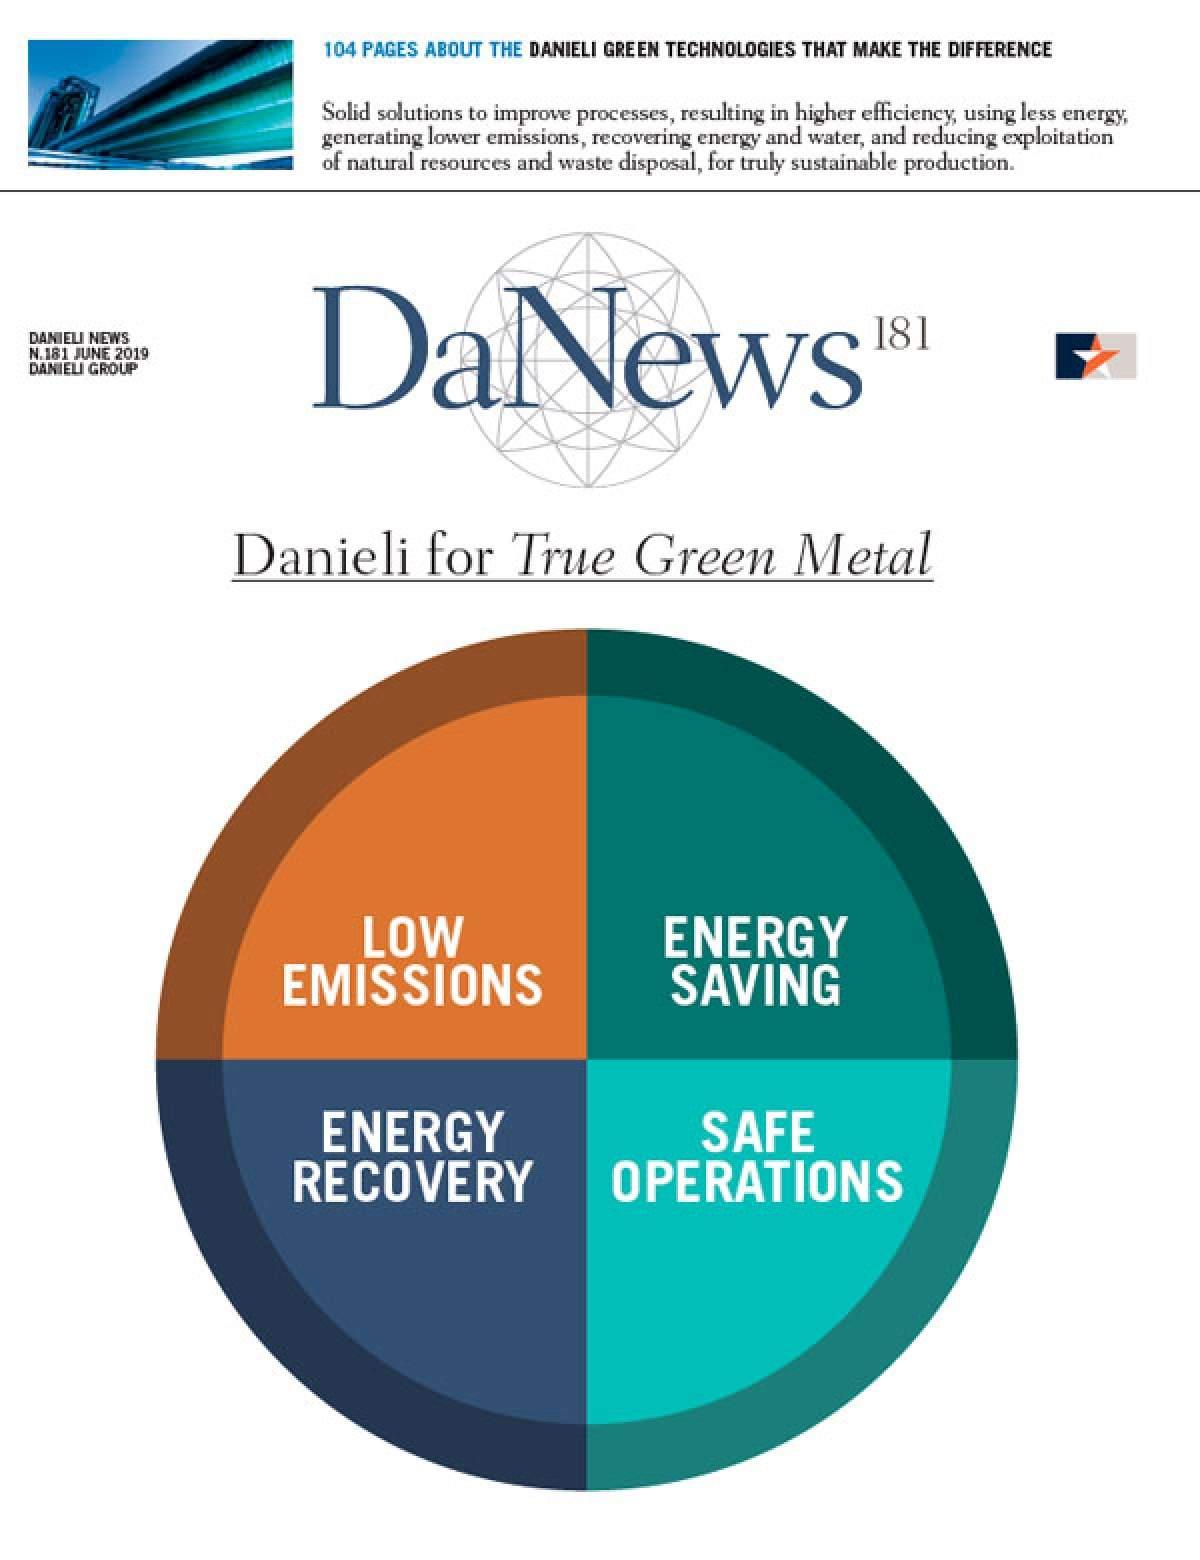 DaNews DaNews 181